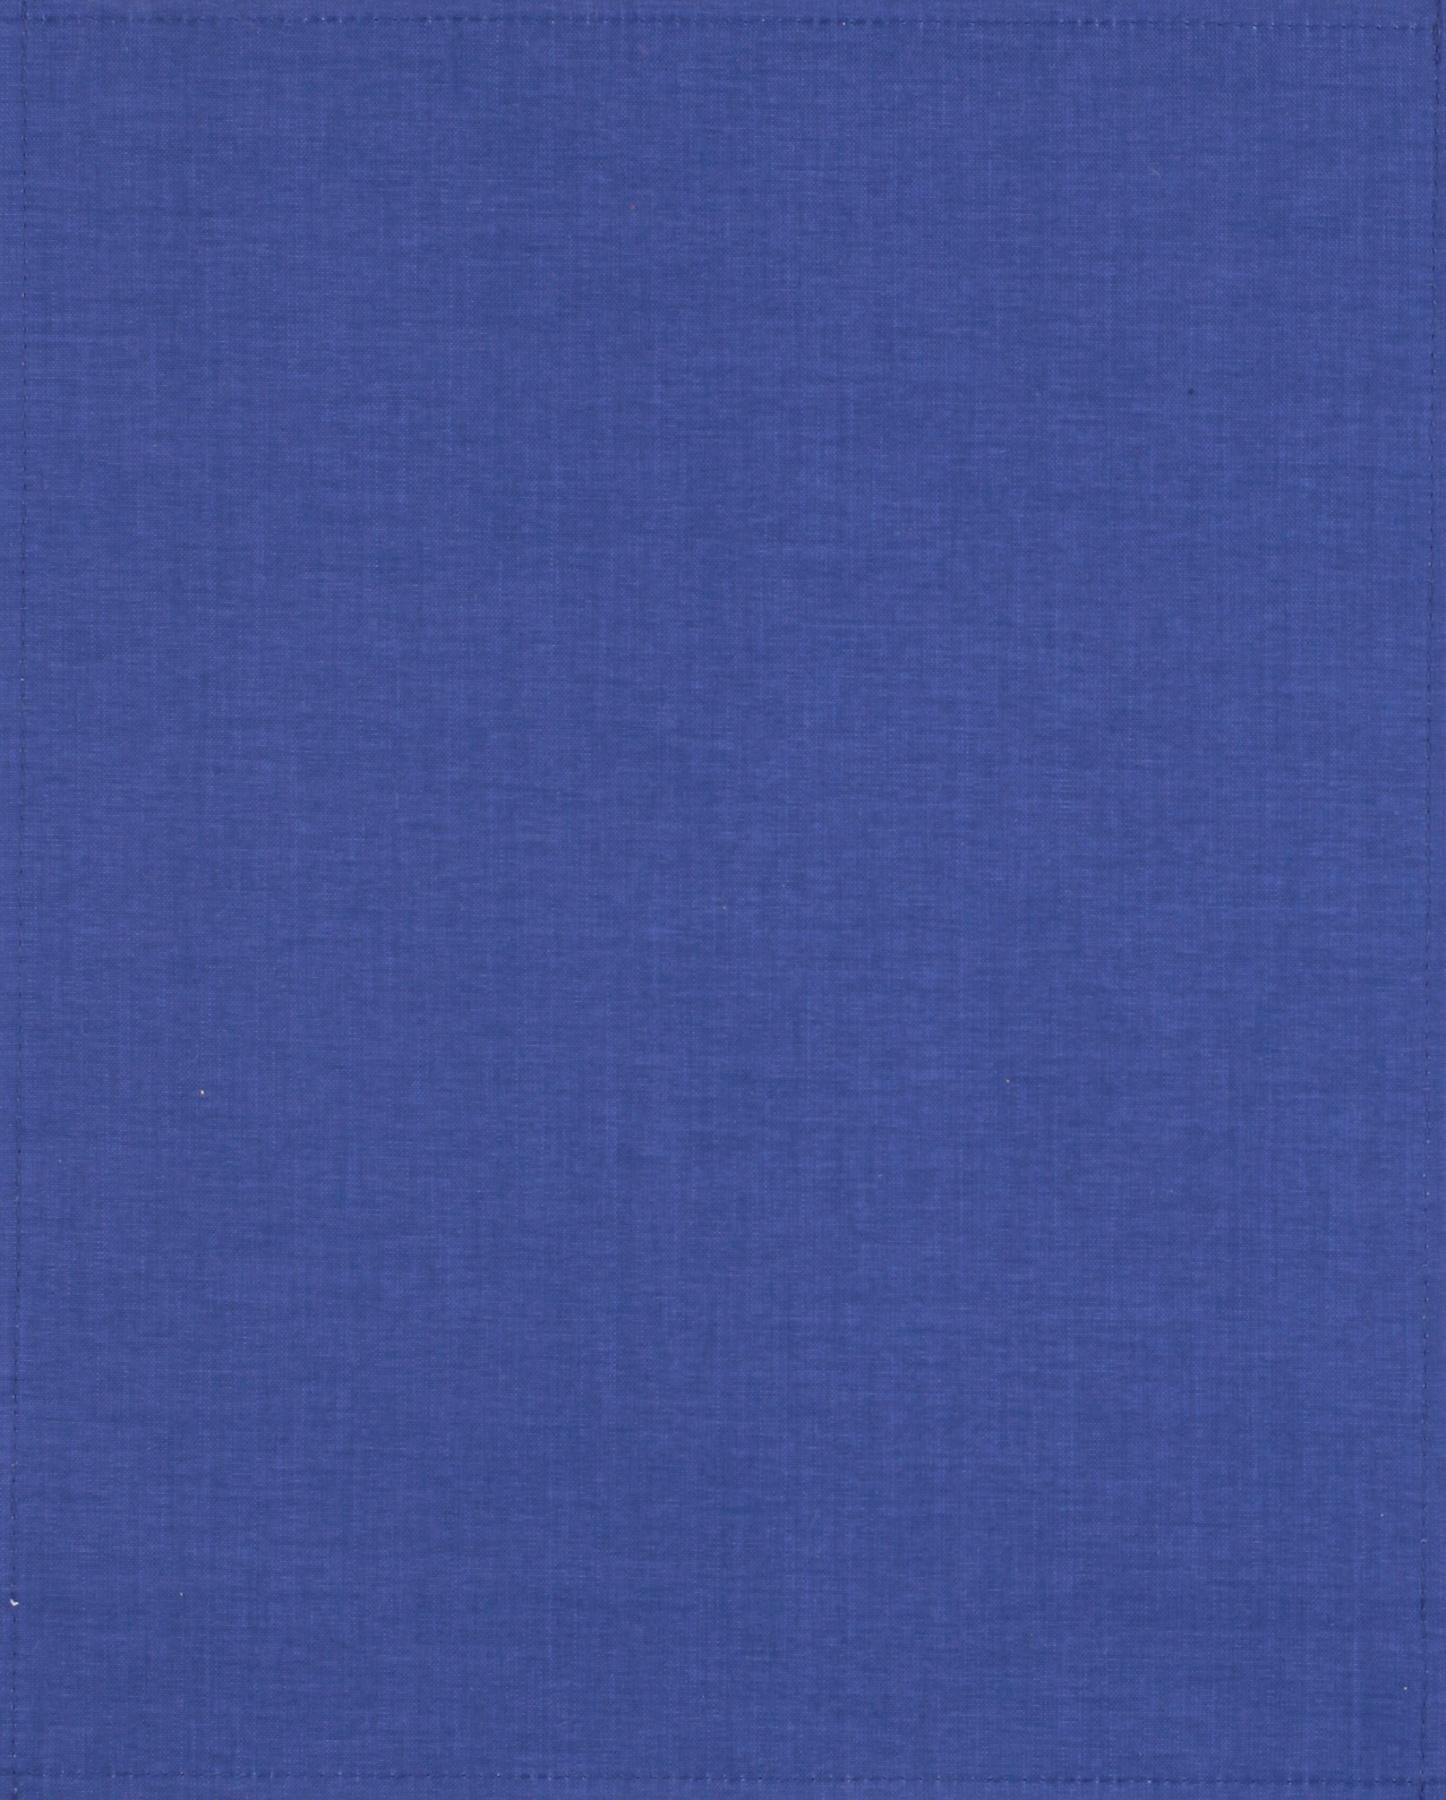 Cordura blau (groß)